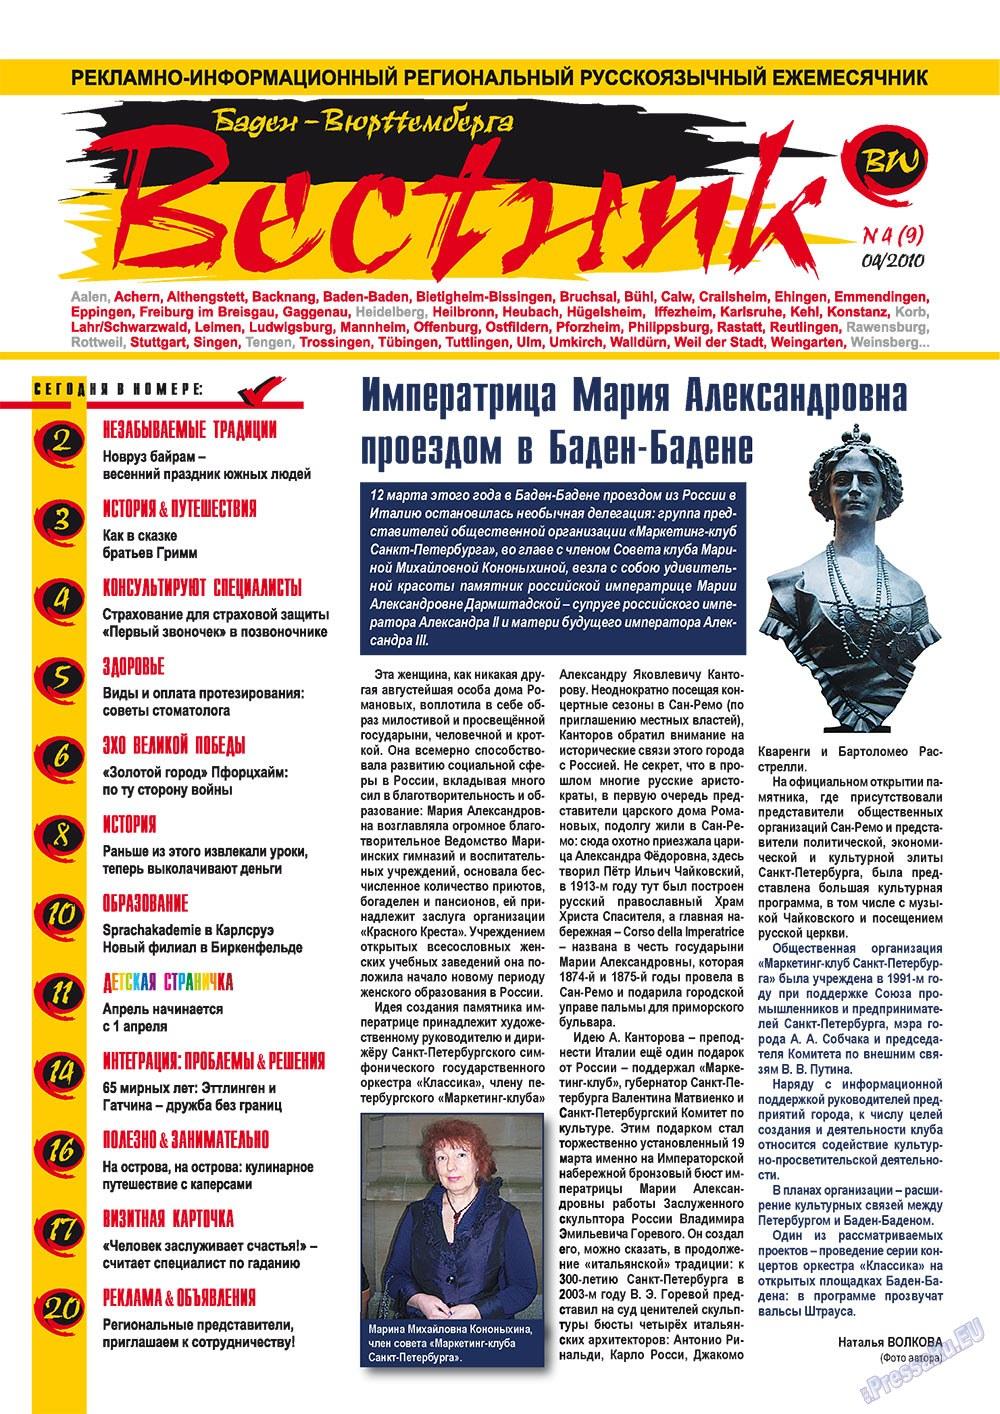 Вестник-info (журнал). 2010 год, номер 4, стр. 1